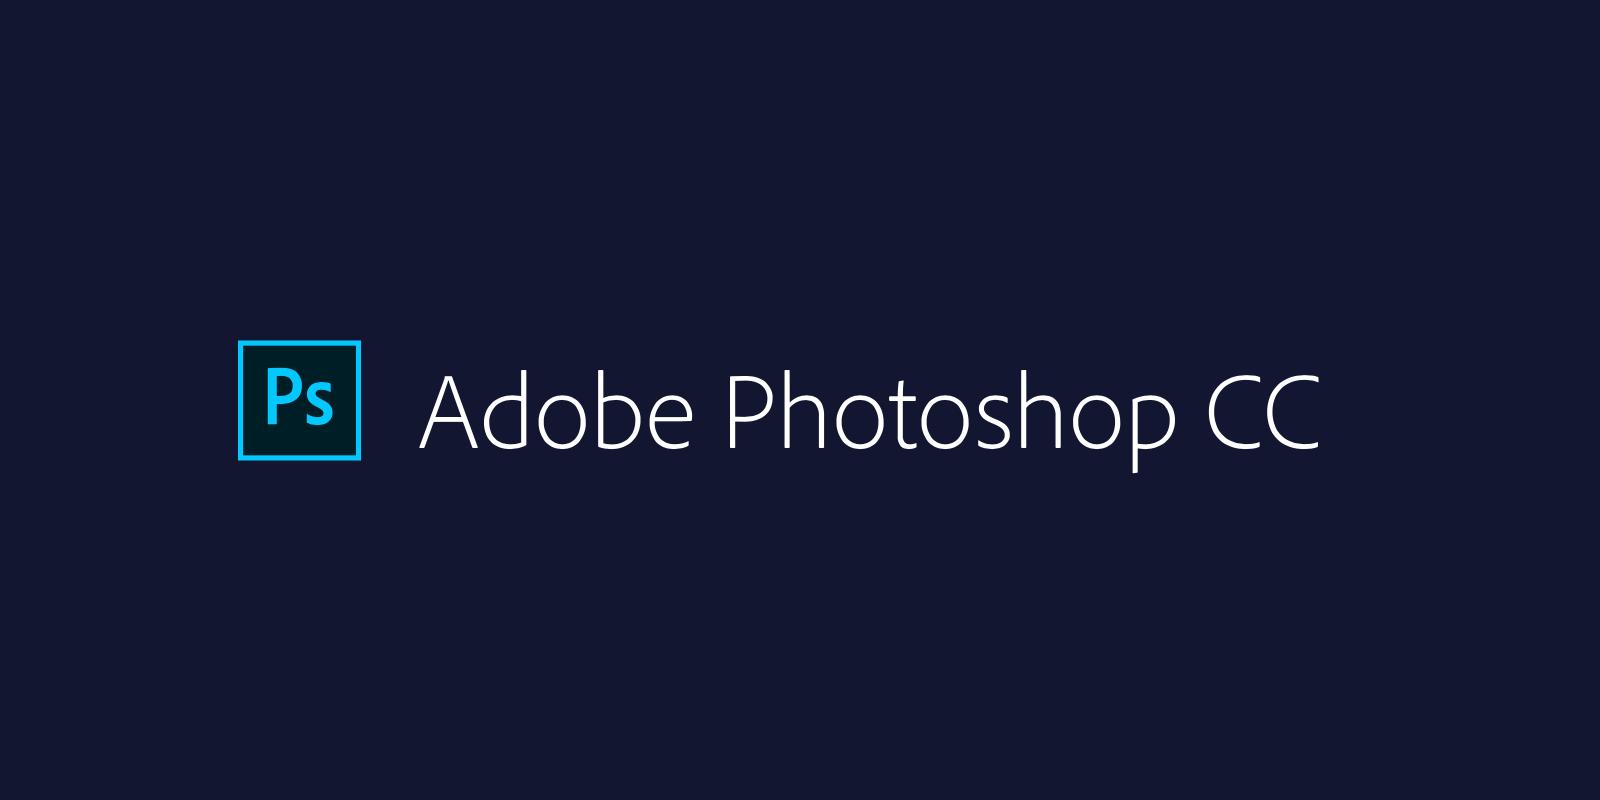 Photoshop Logo PNG - 9697